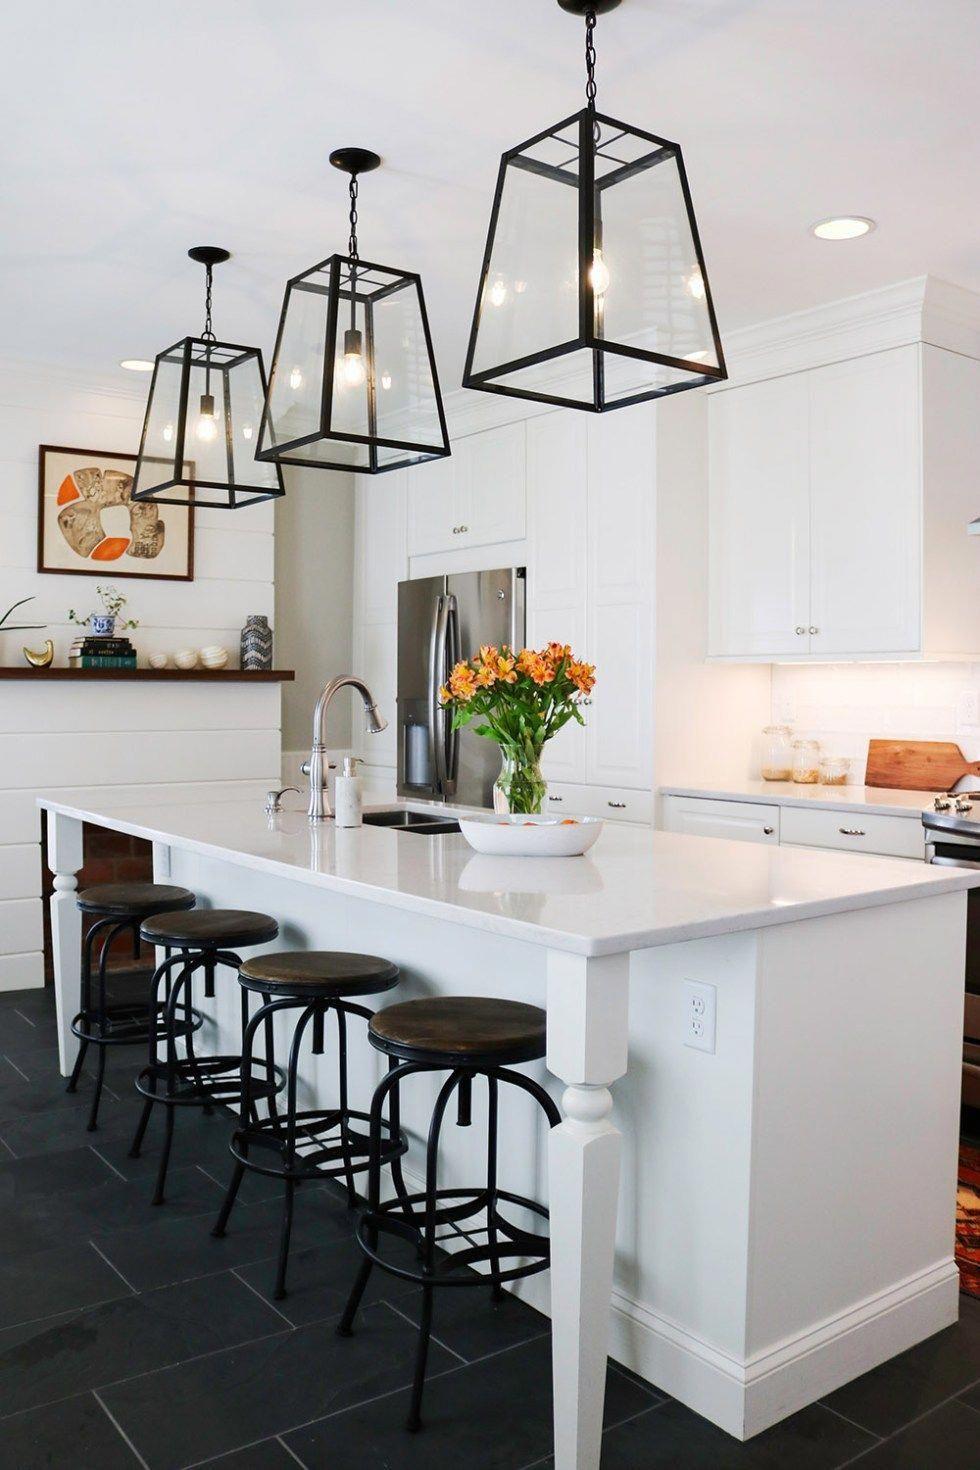 Fells point baltimore ikea kitchen remodel ikea bodbyn cabinets